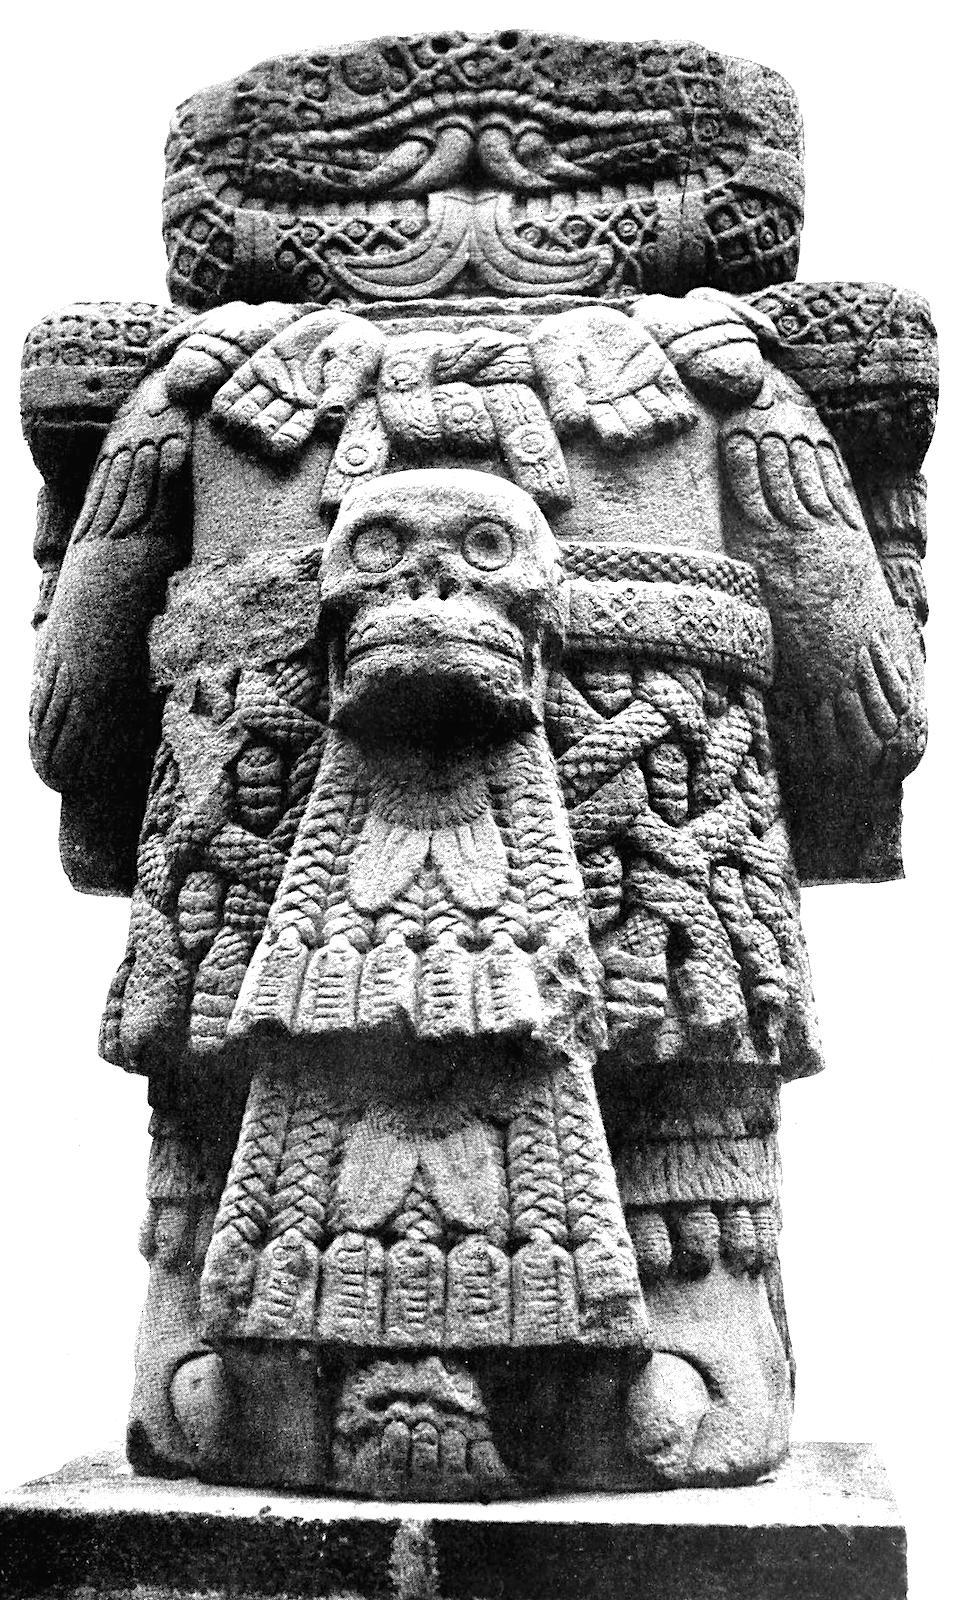 an Aztec demon in stone